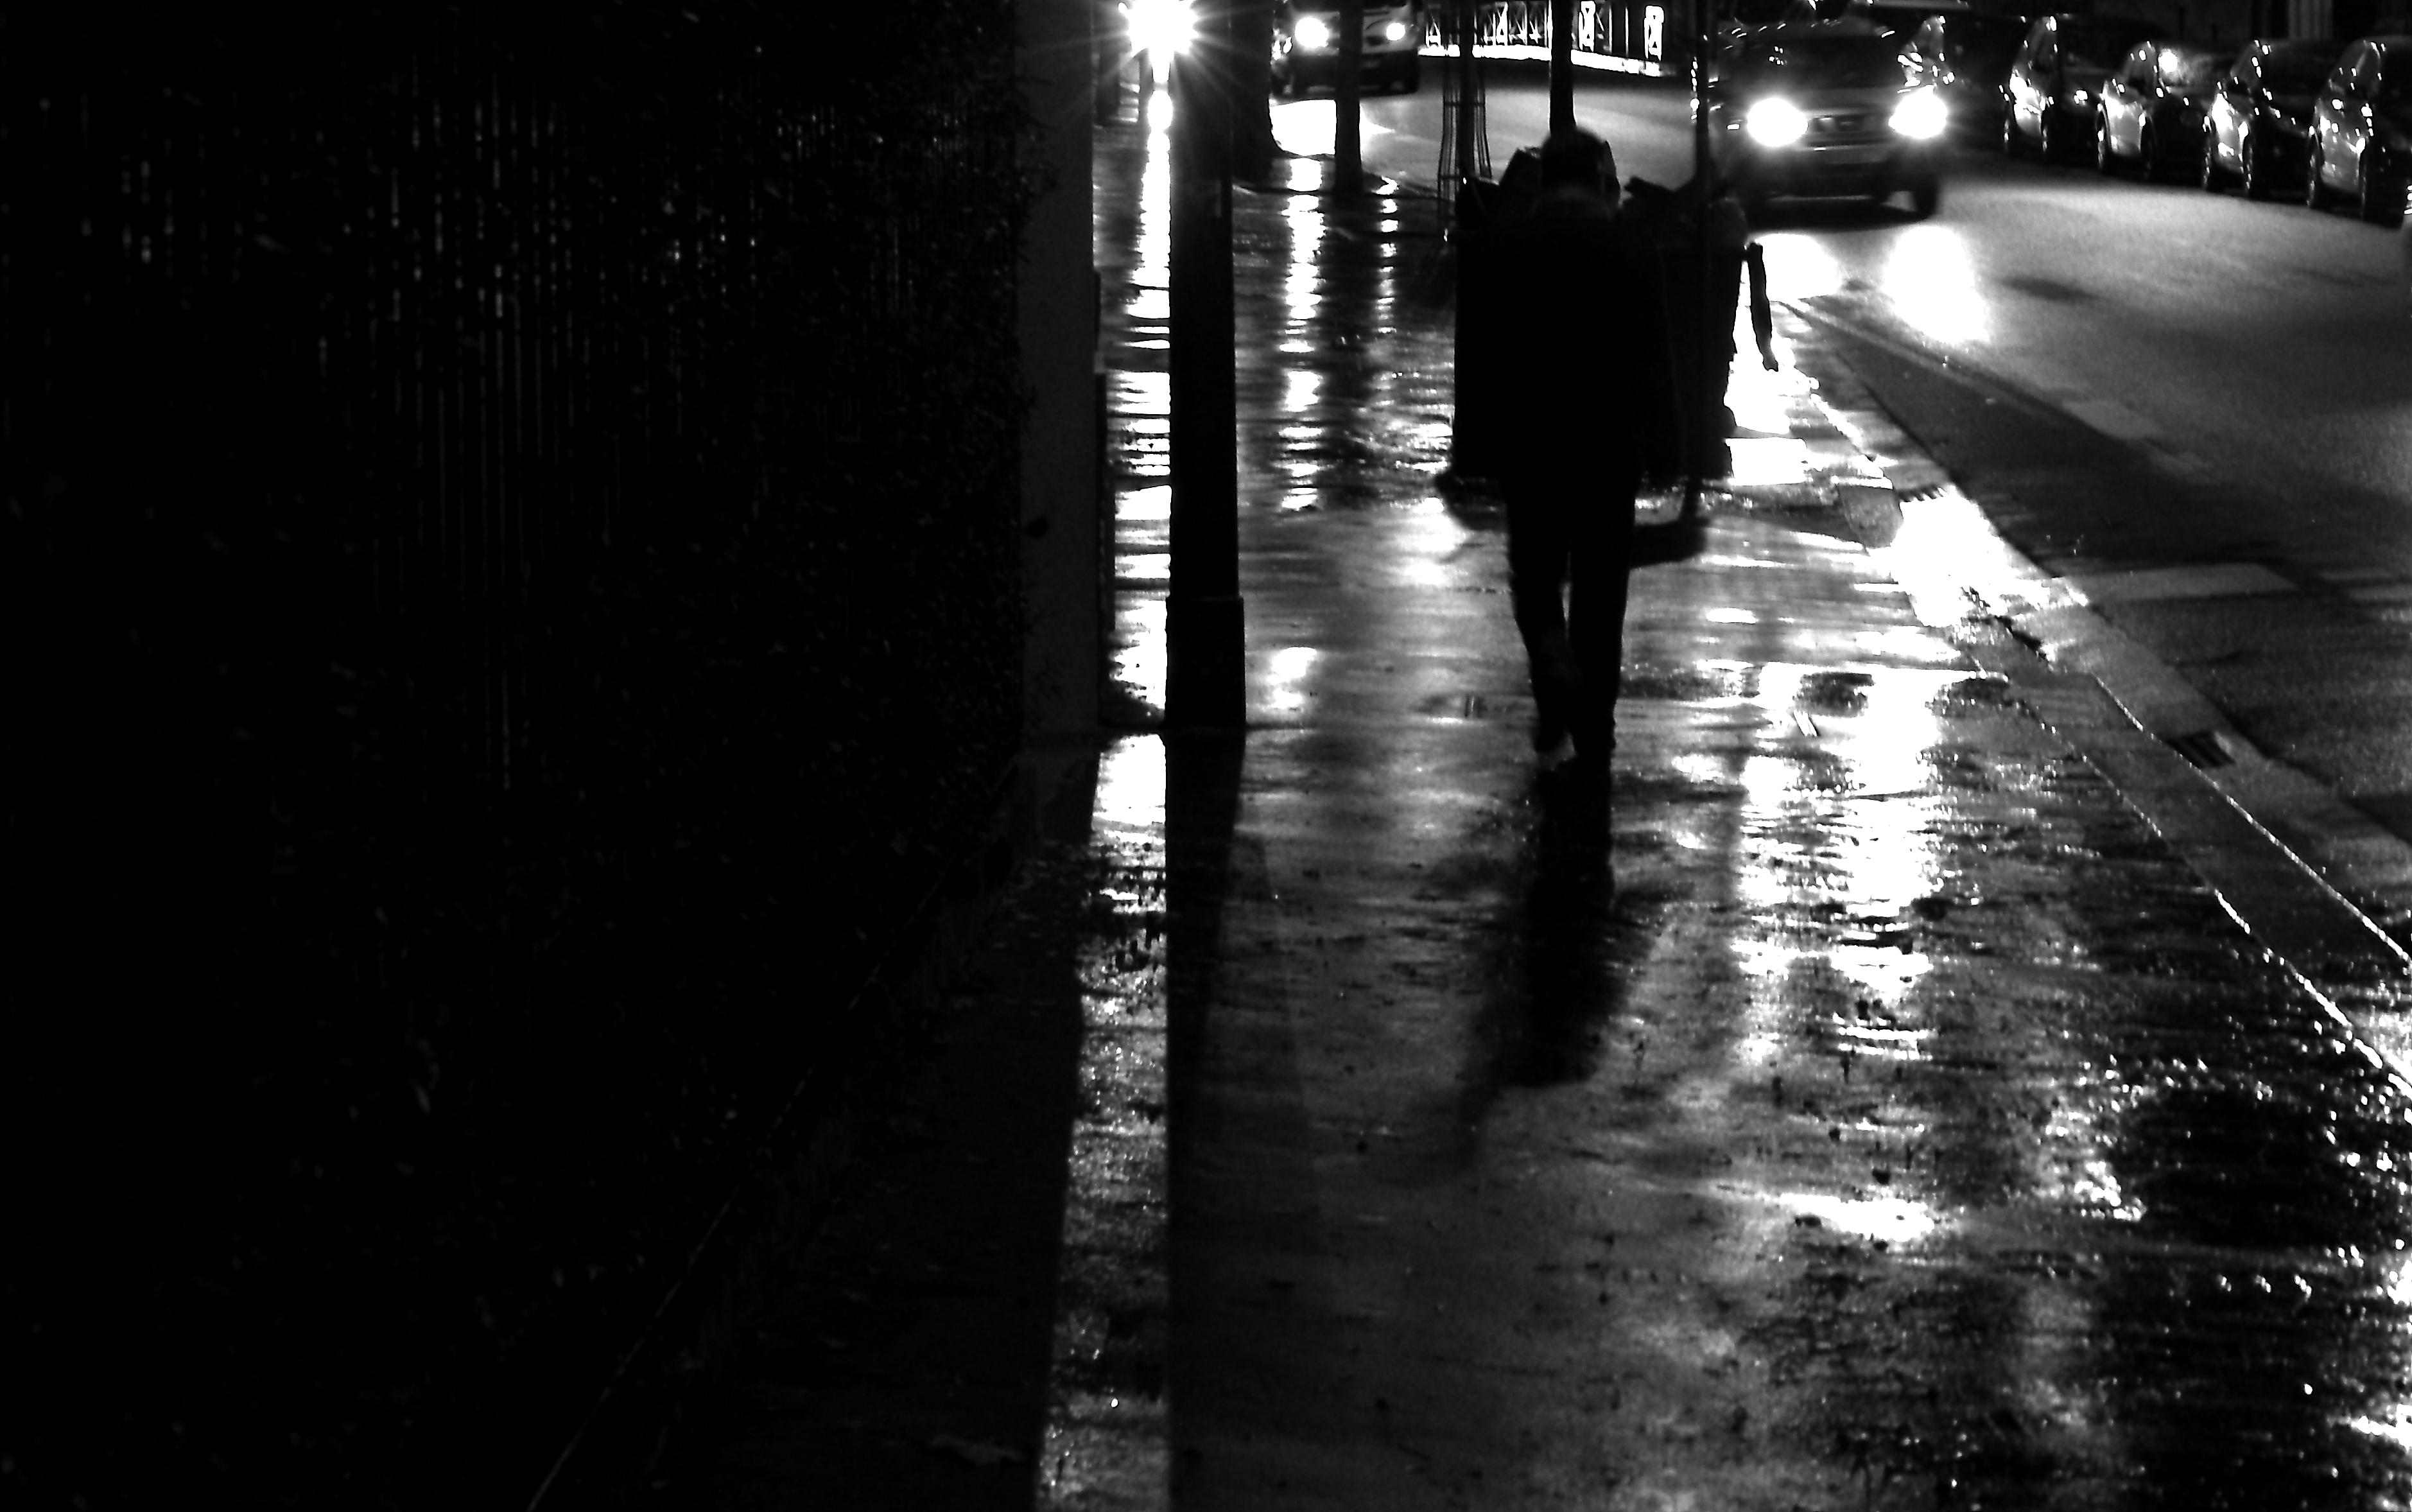 Wallpaper Street Light Night Water Urban Reflection Shadow Rain Evening Atmosphere Paris Midnight Infrastructure Alley Lighting Cars Streetview Boulevard Darkness Rue Nuit Noiretblanc Blackandwithe Photoderue Snapshot Lumiere